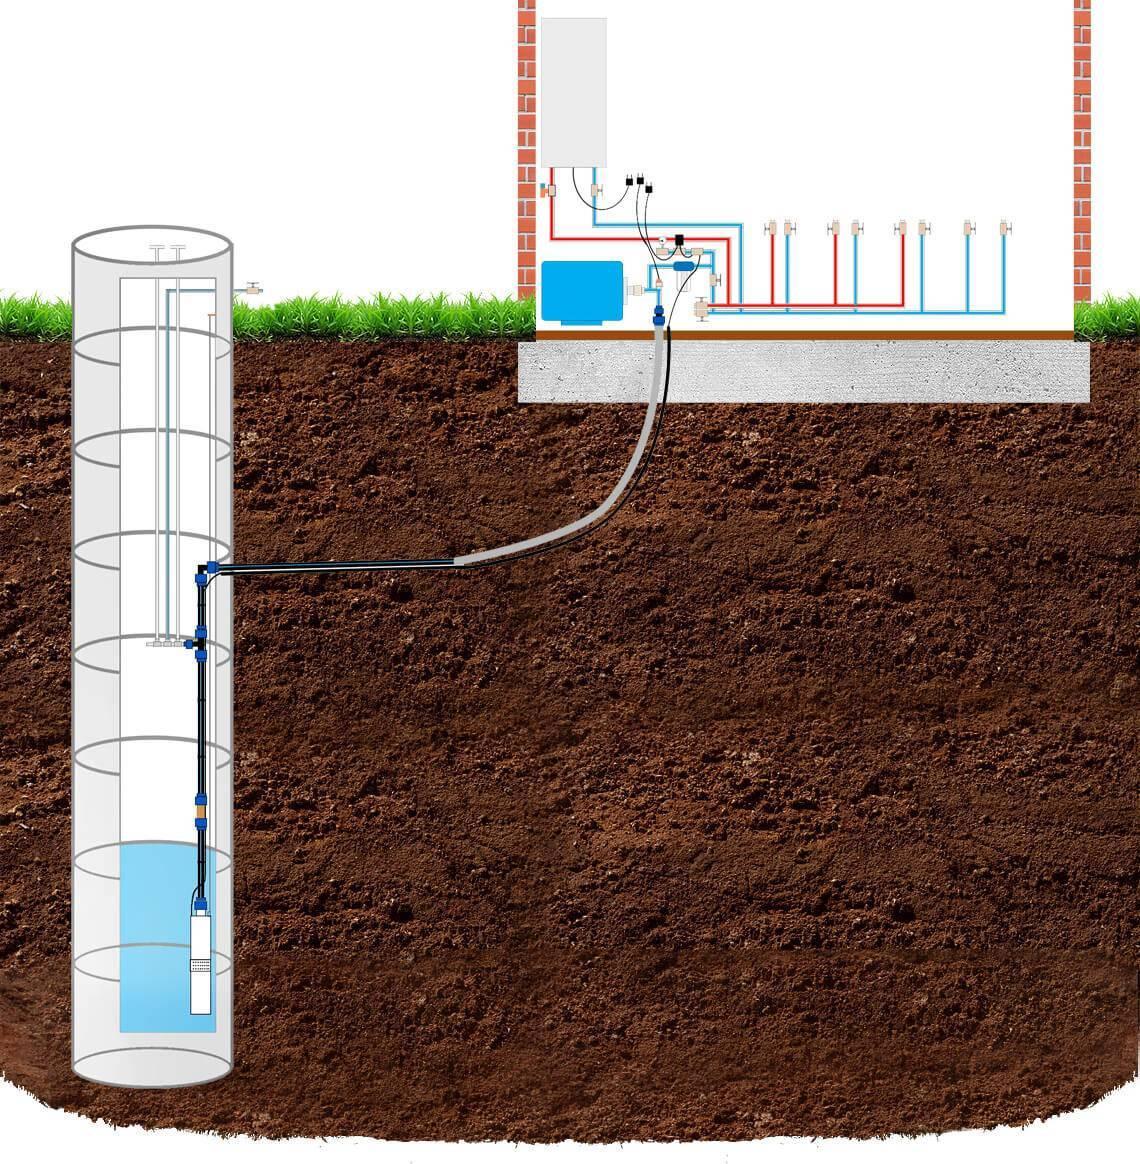 Преимущества автономного водопровода из колодца на даче